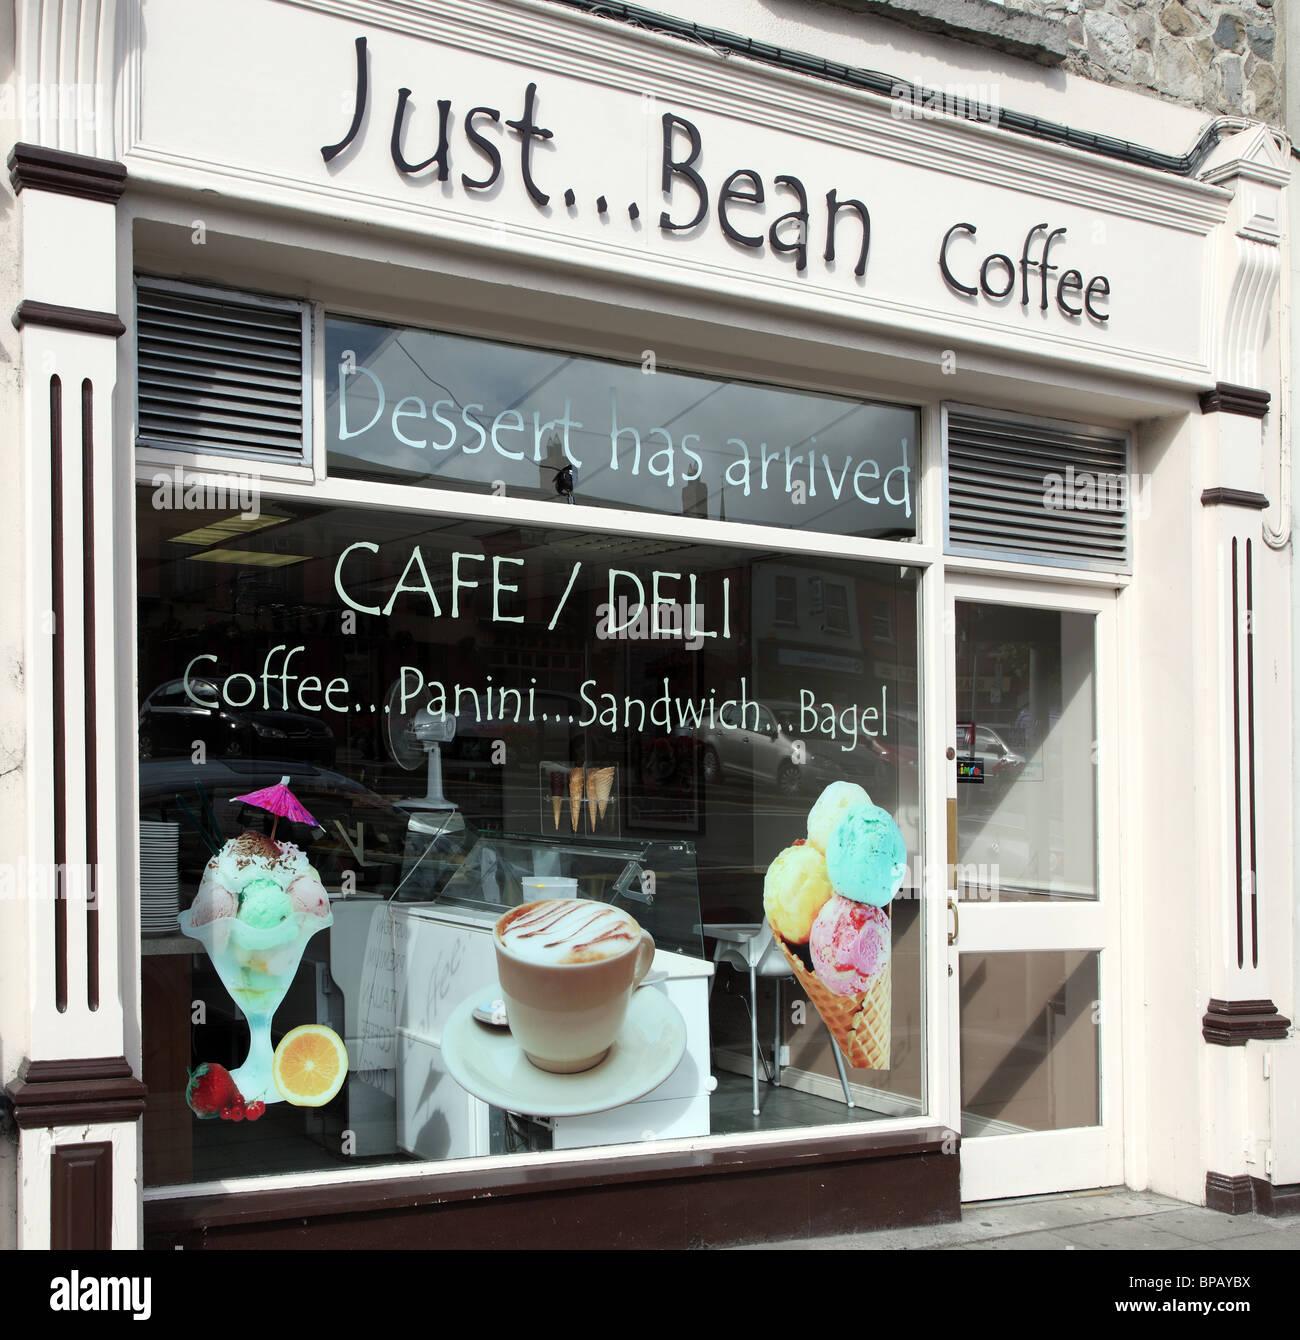 Just Bean Cafe Deli, Main Street, Carrickmacross, Co. Monaghan, Ireland - Stock Image